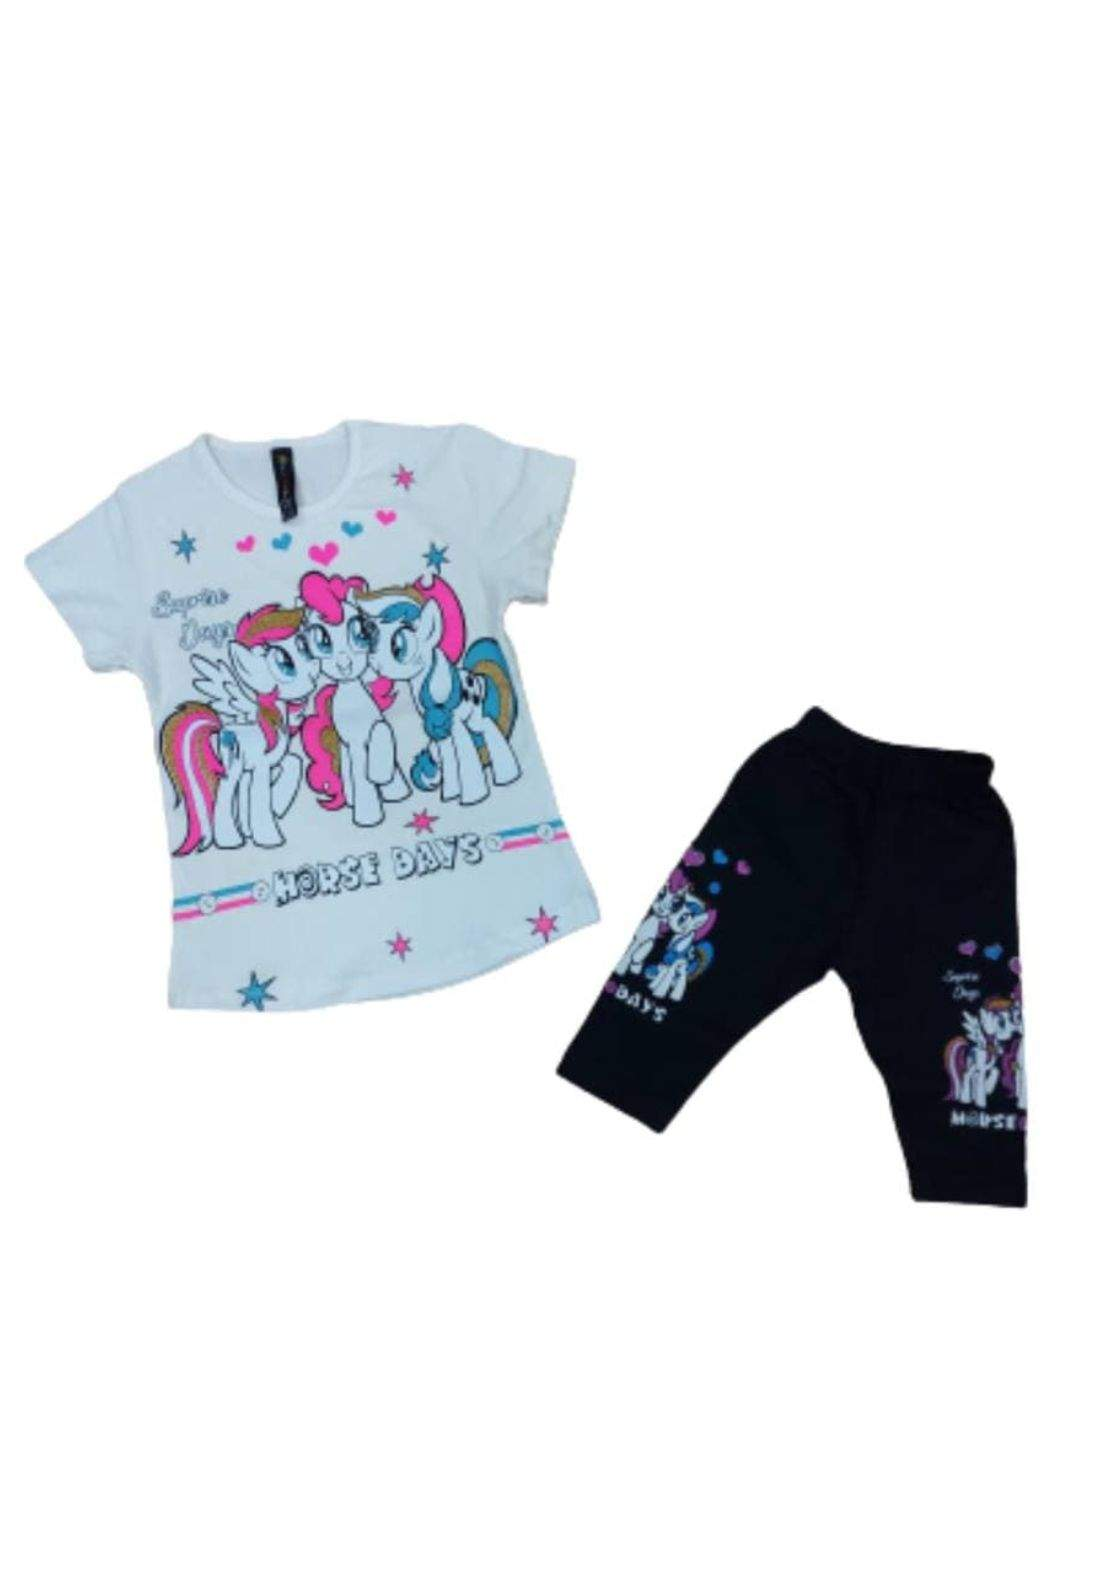 Tracksuit for girls white  (T-shirt +short) ( تراكسوت ابيض (برموده وتيشيرت